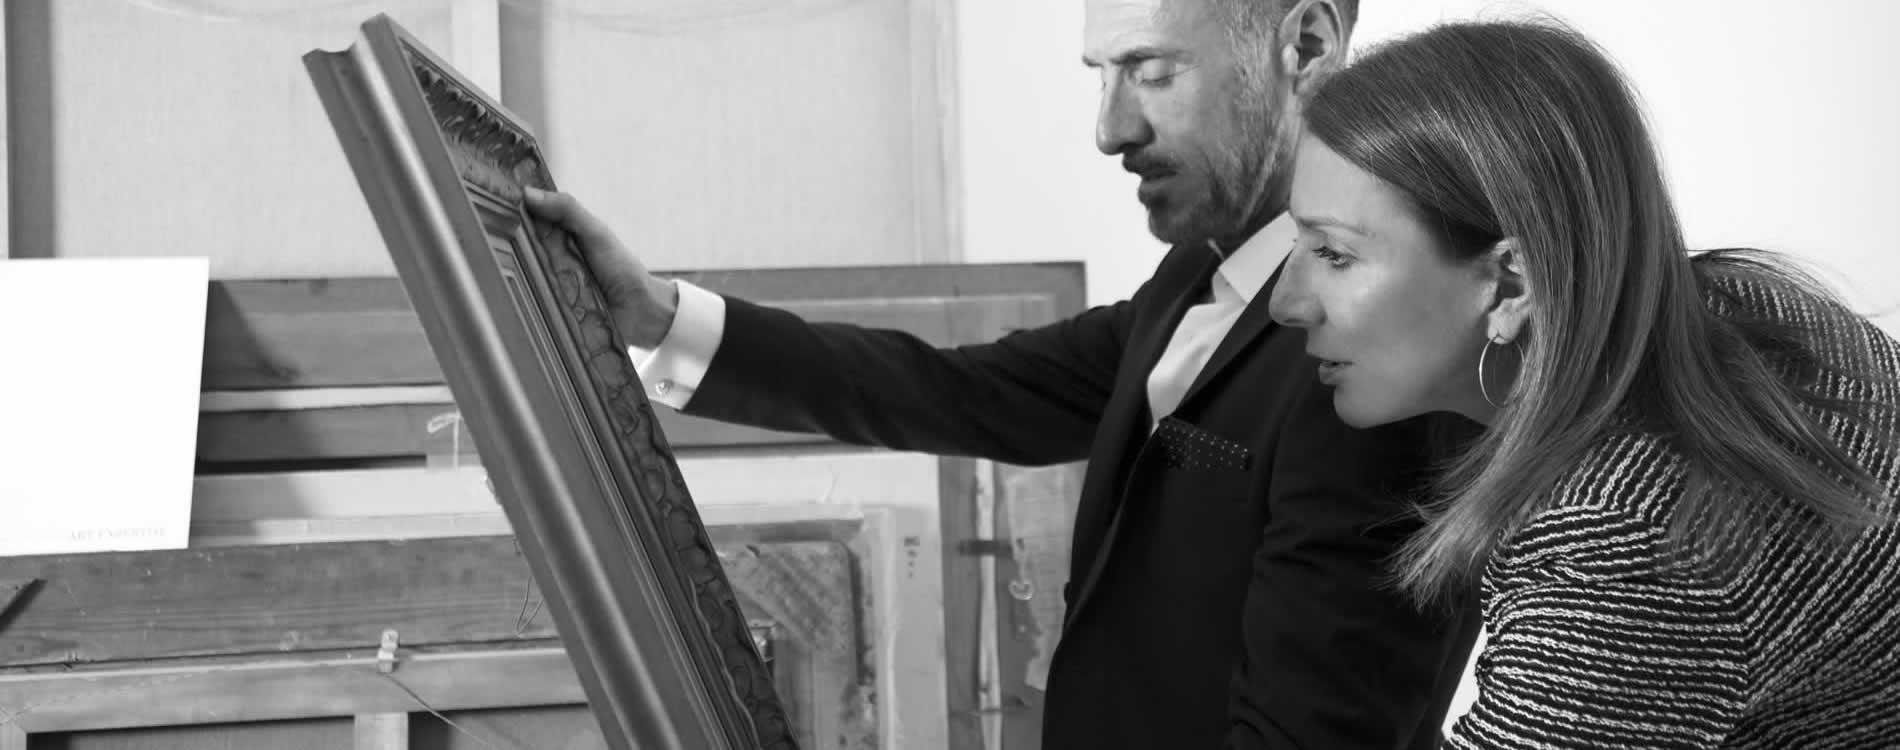 art expertise   athens - greece